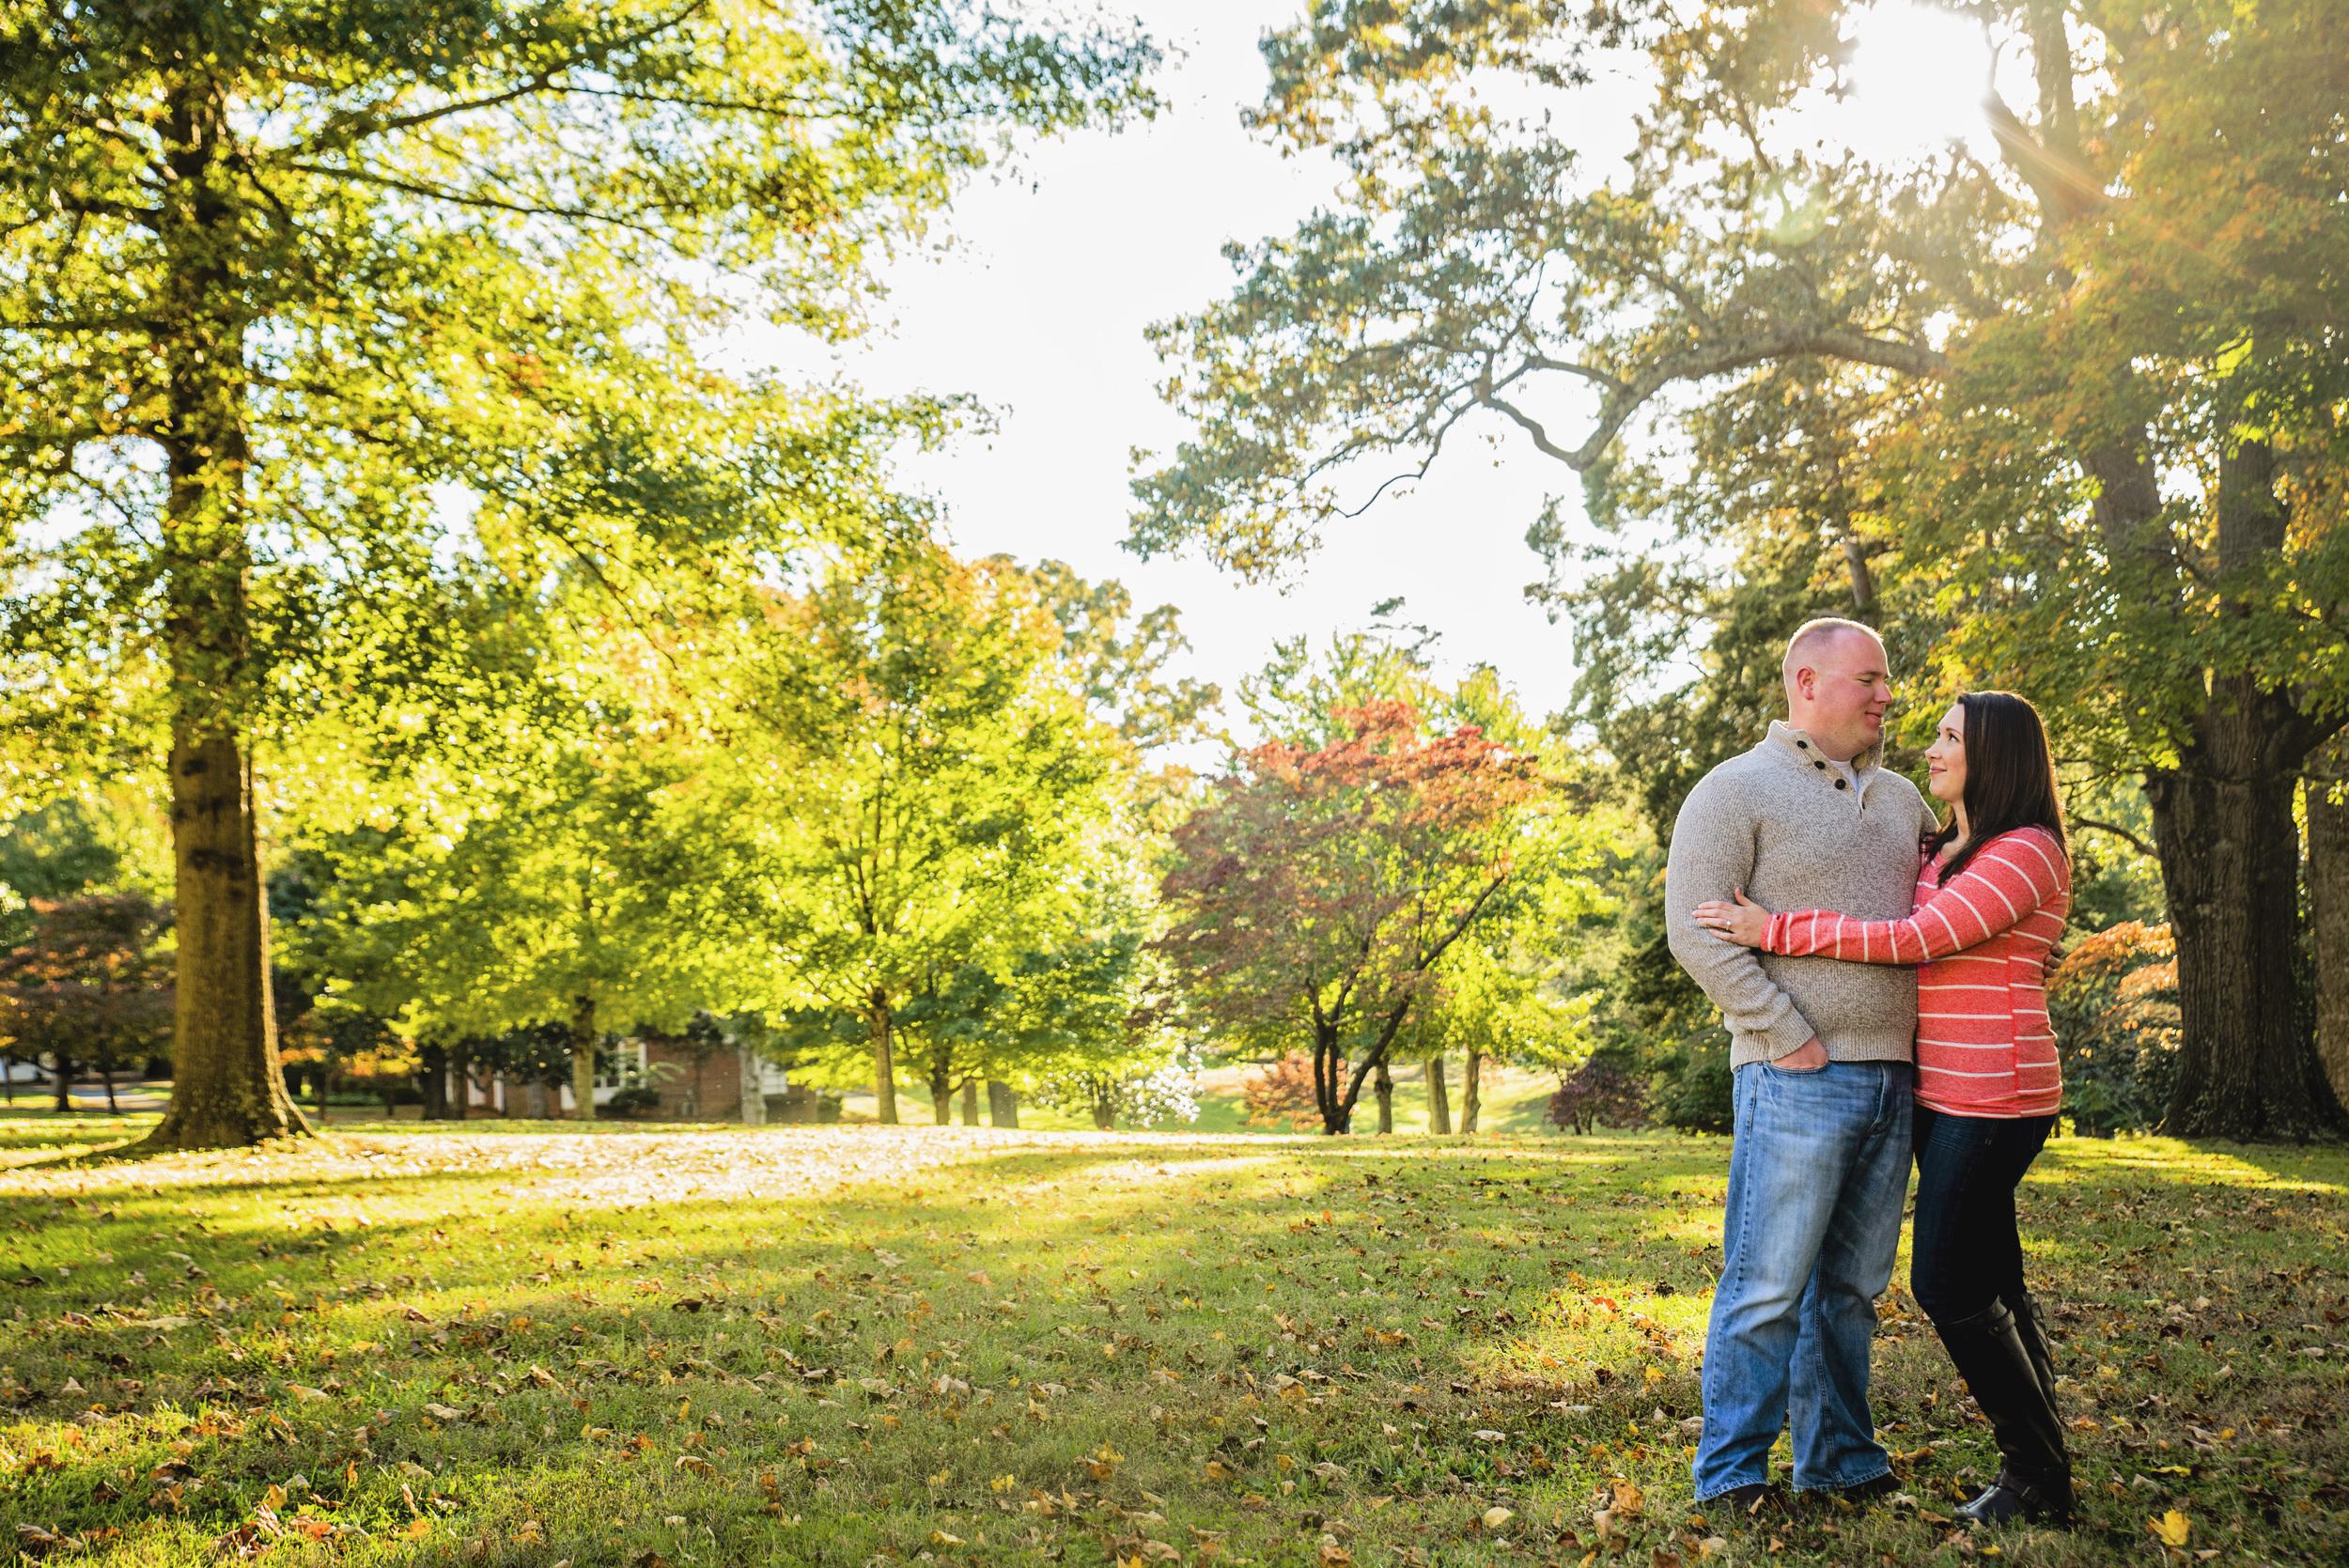 fall_romantic_park_engagement_session_lynchburg_va002.jpg